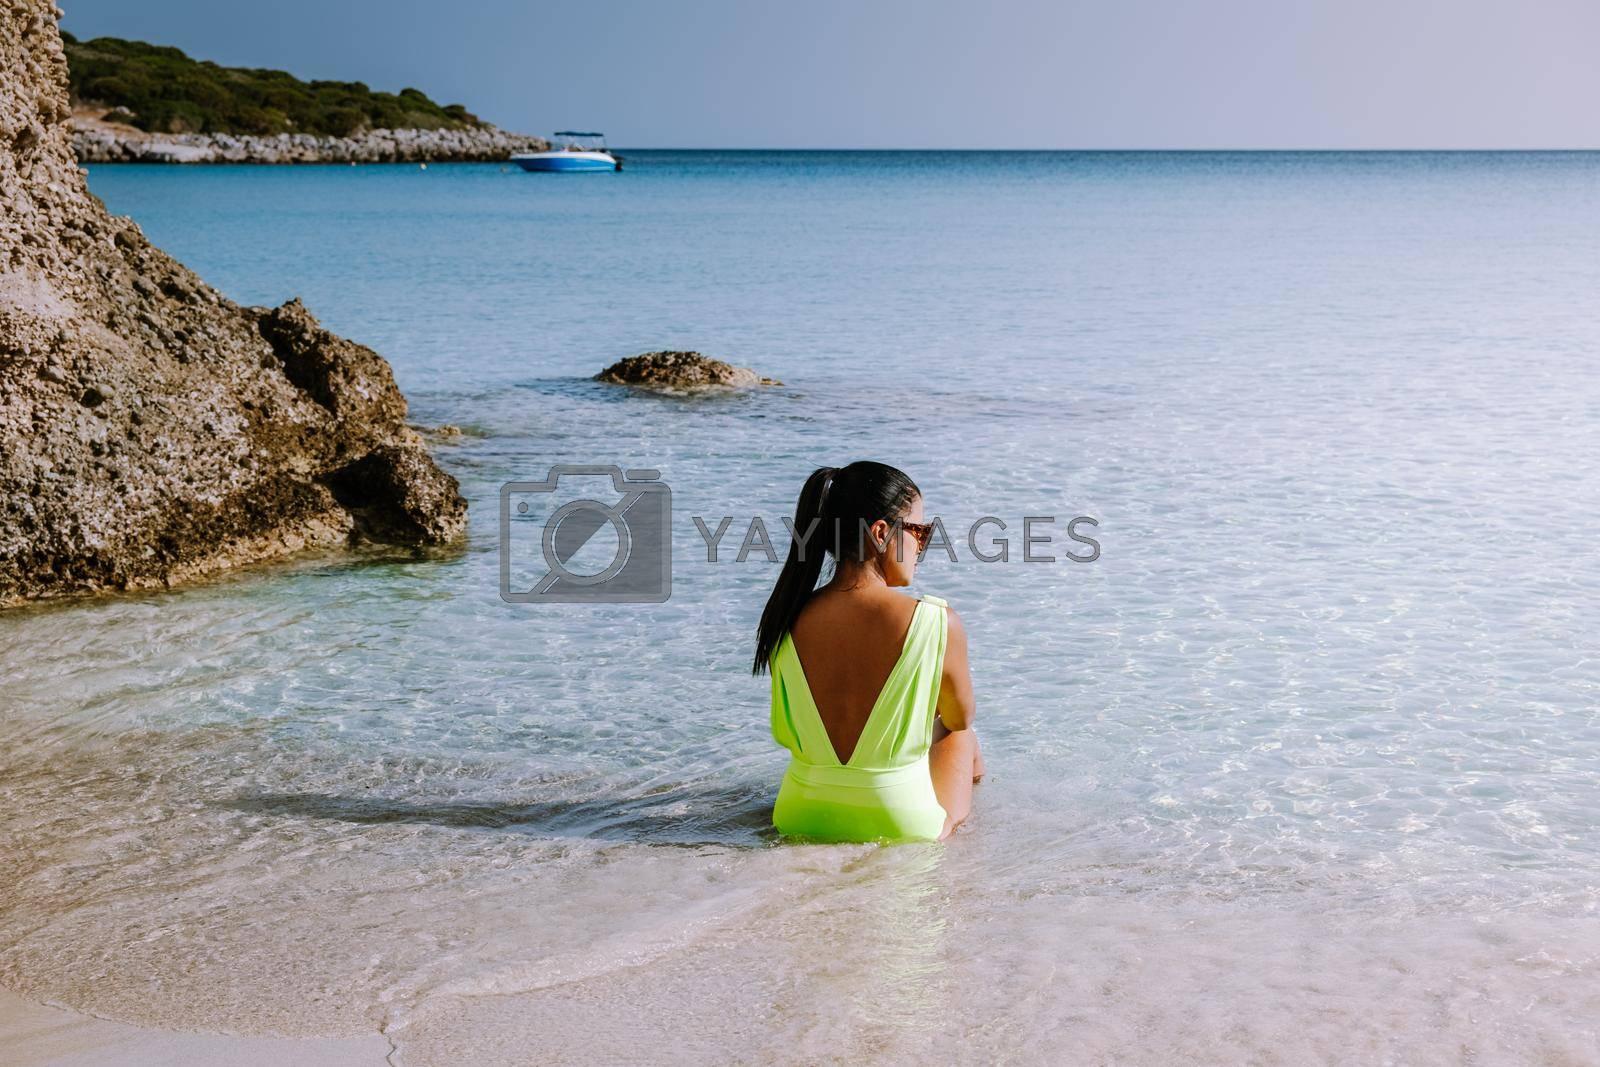 Tropical beach of Voulisma beach, Istron, Crete, Greece ,Most beautiful beaches of Crete island -Istron bay near Agios Nikolaos. young woman on the beach of Crete